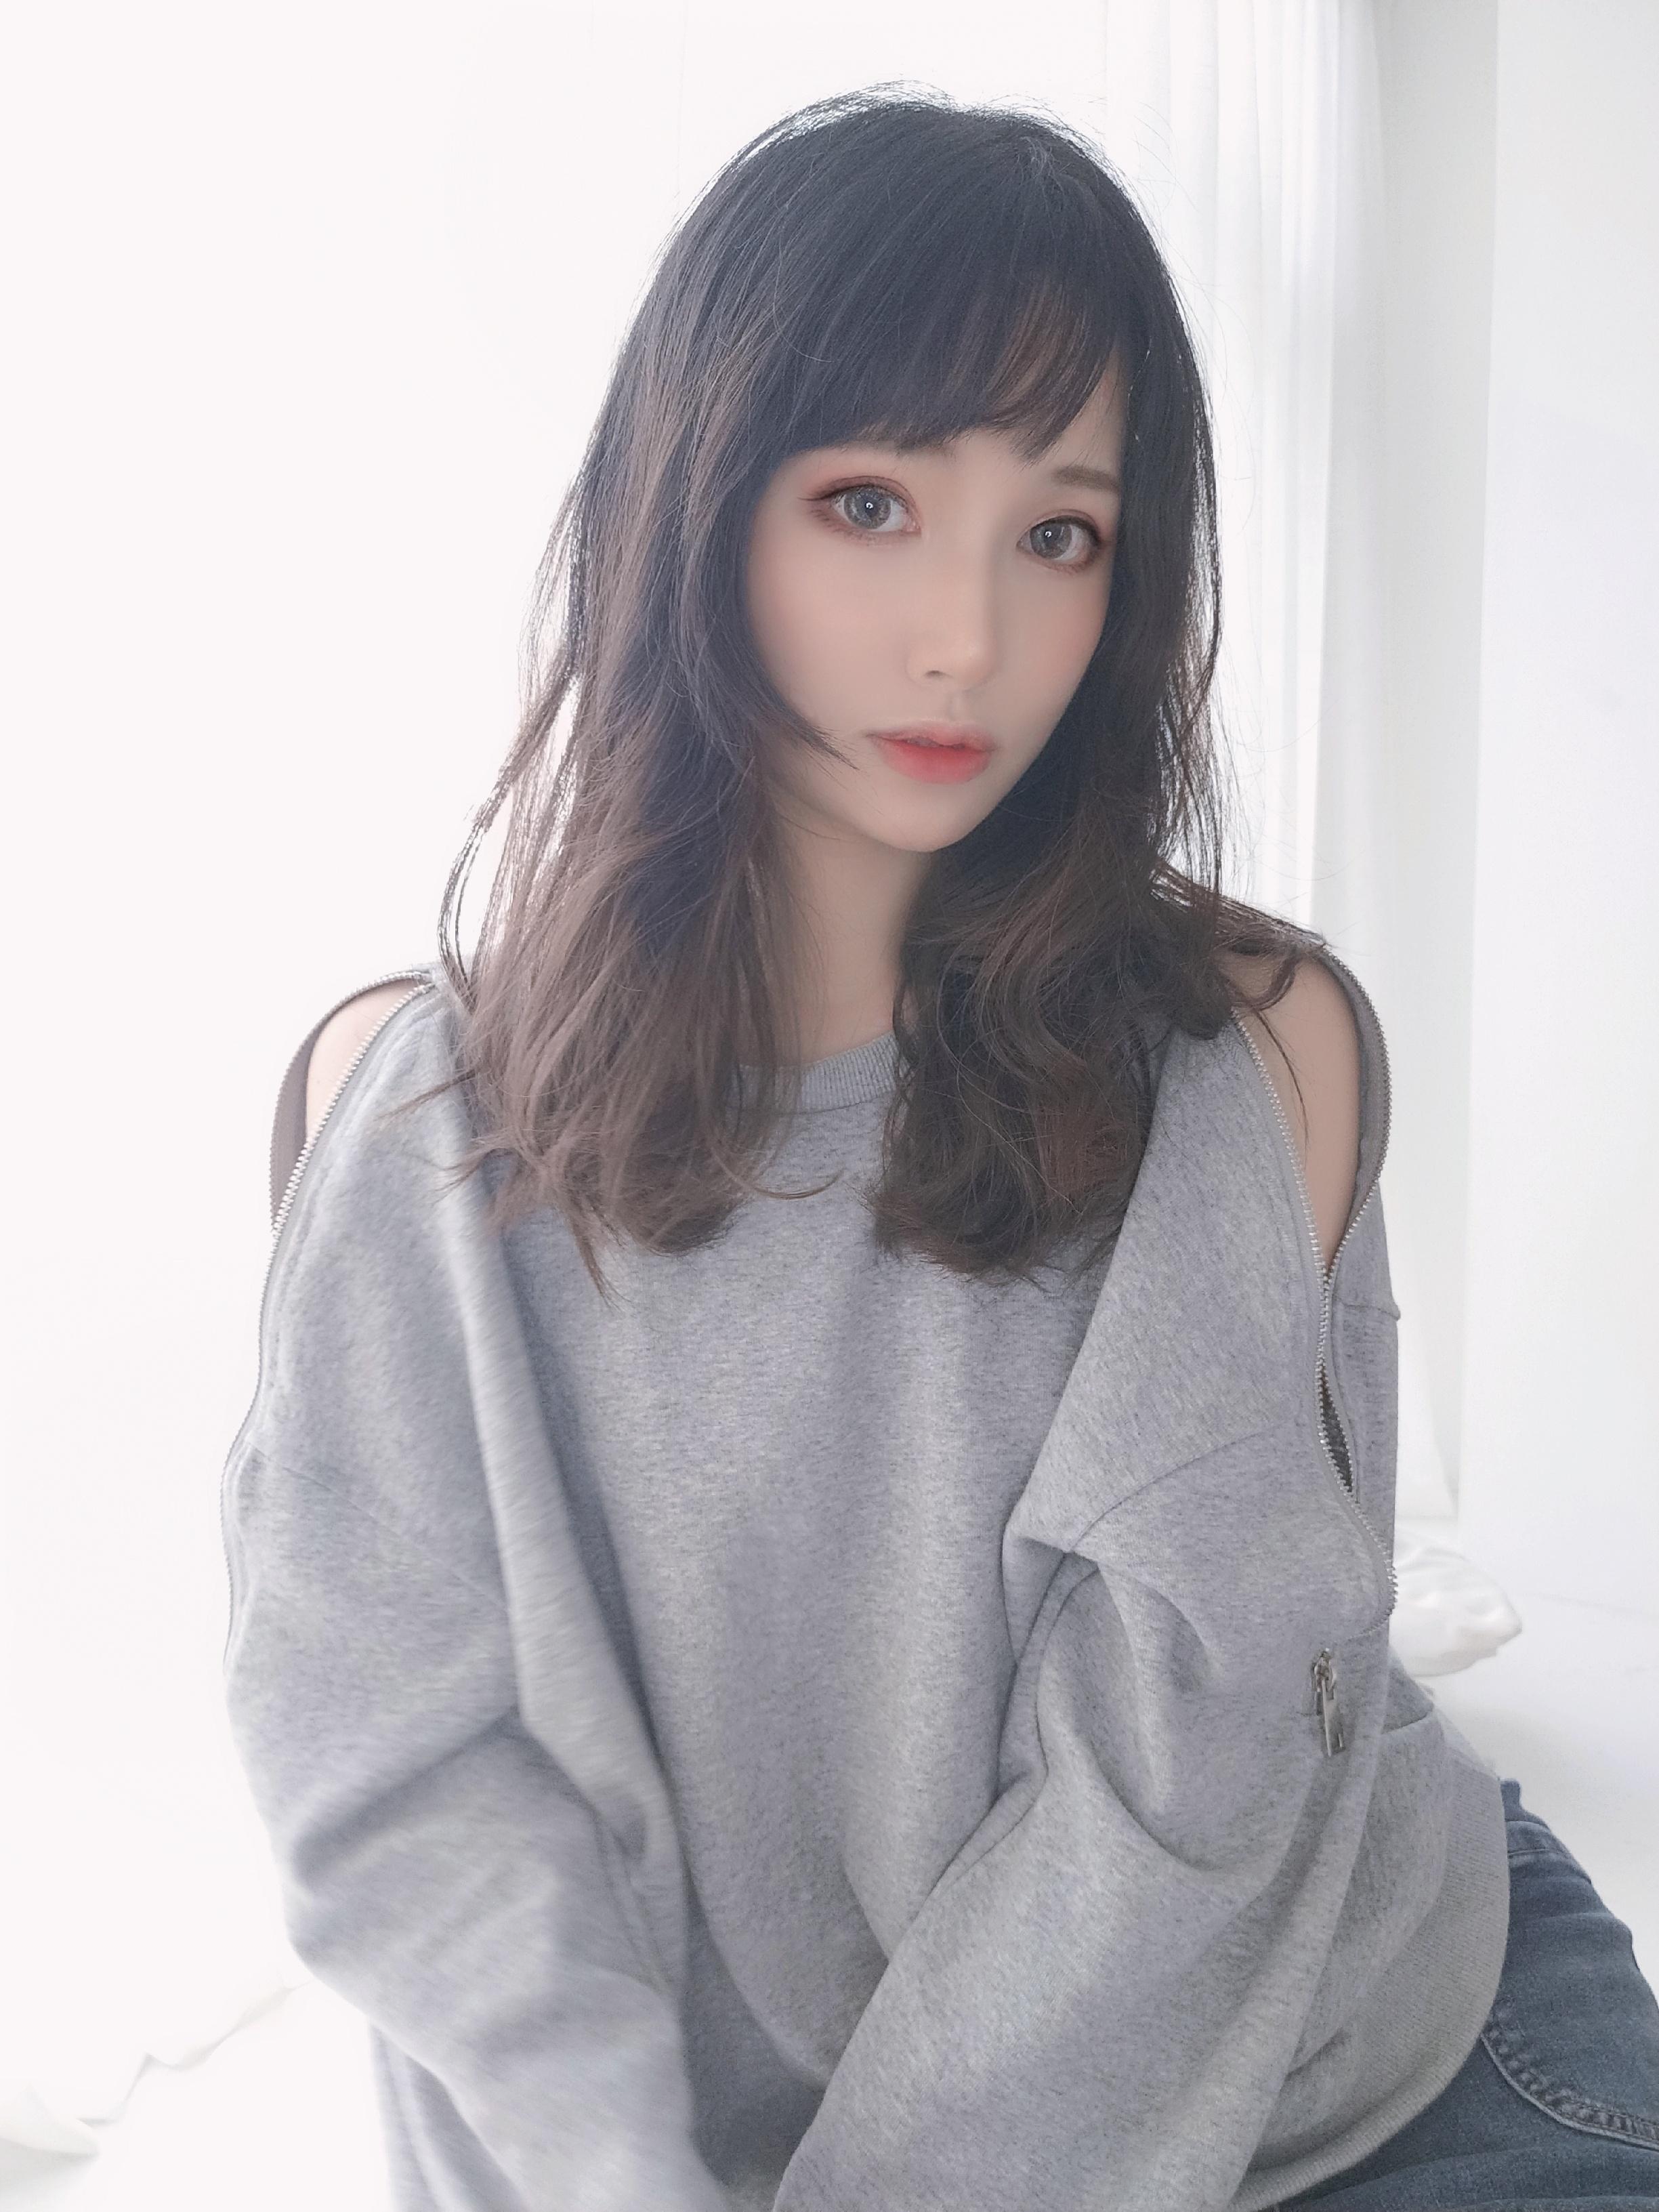 宅男咪zhainanmi.net (5)